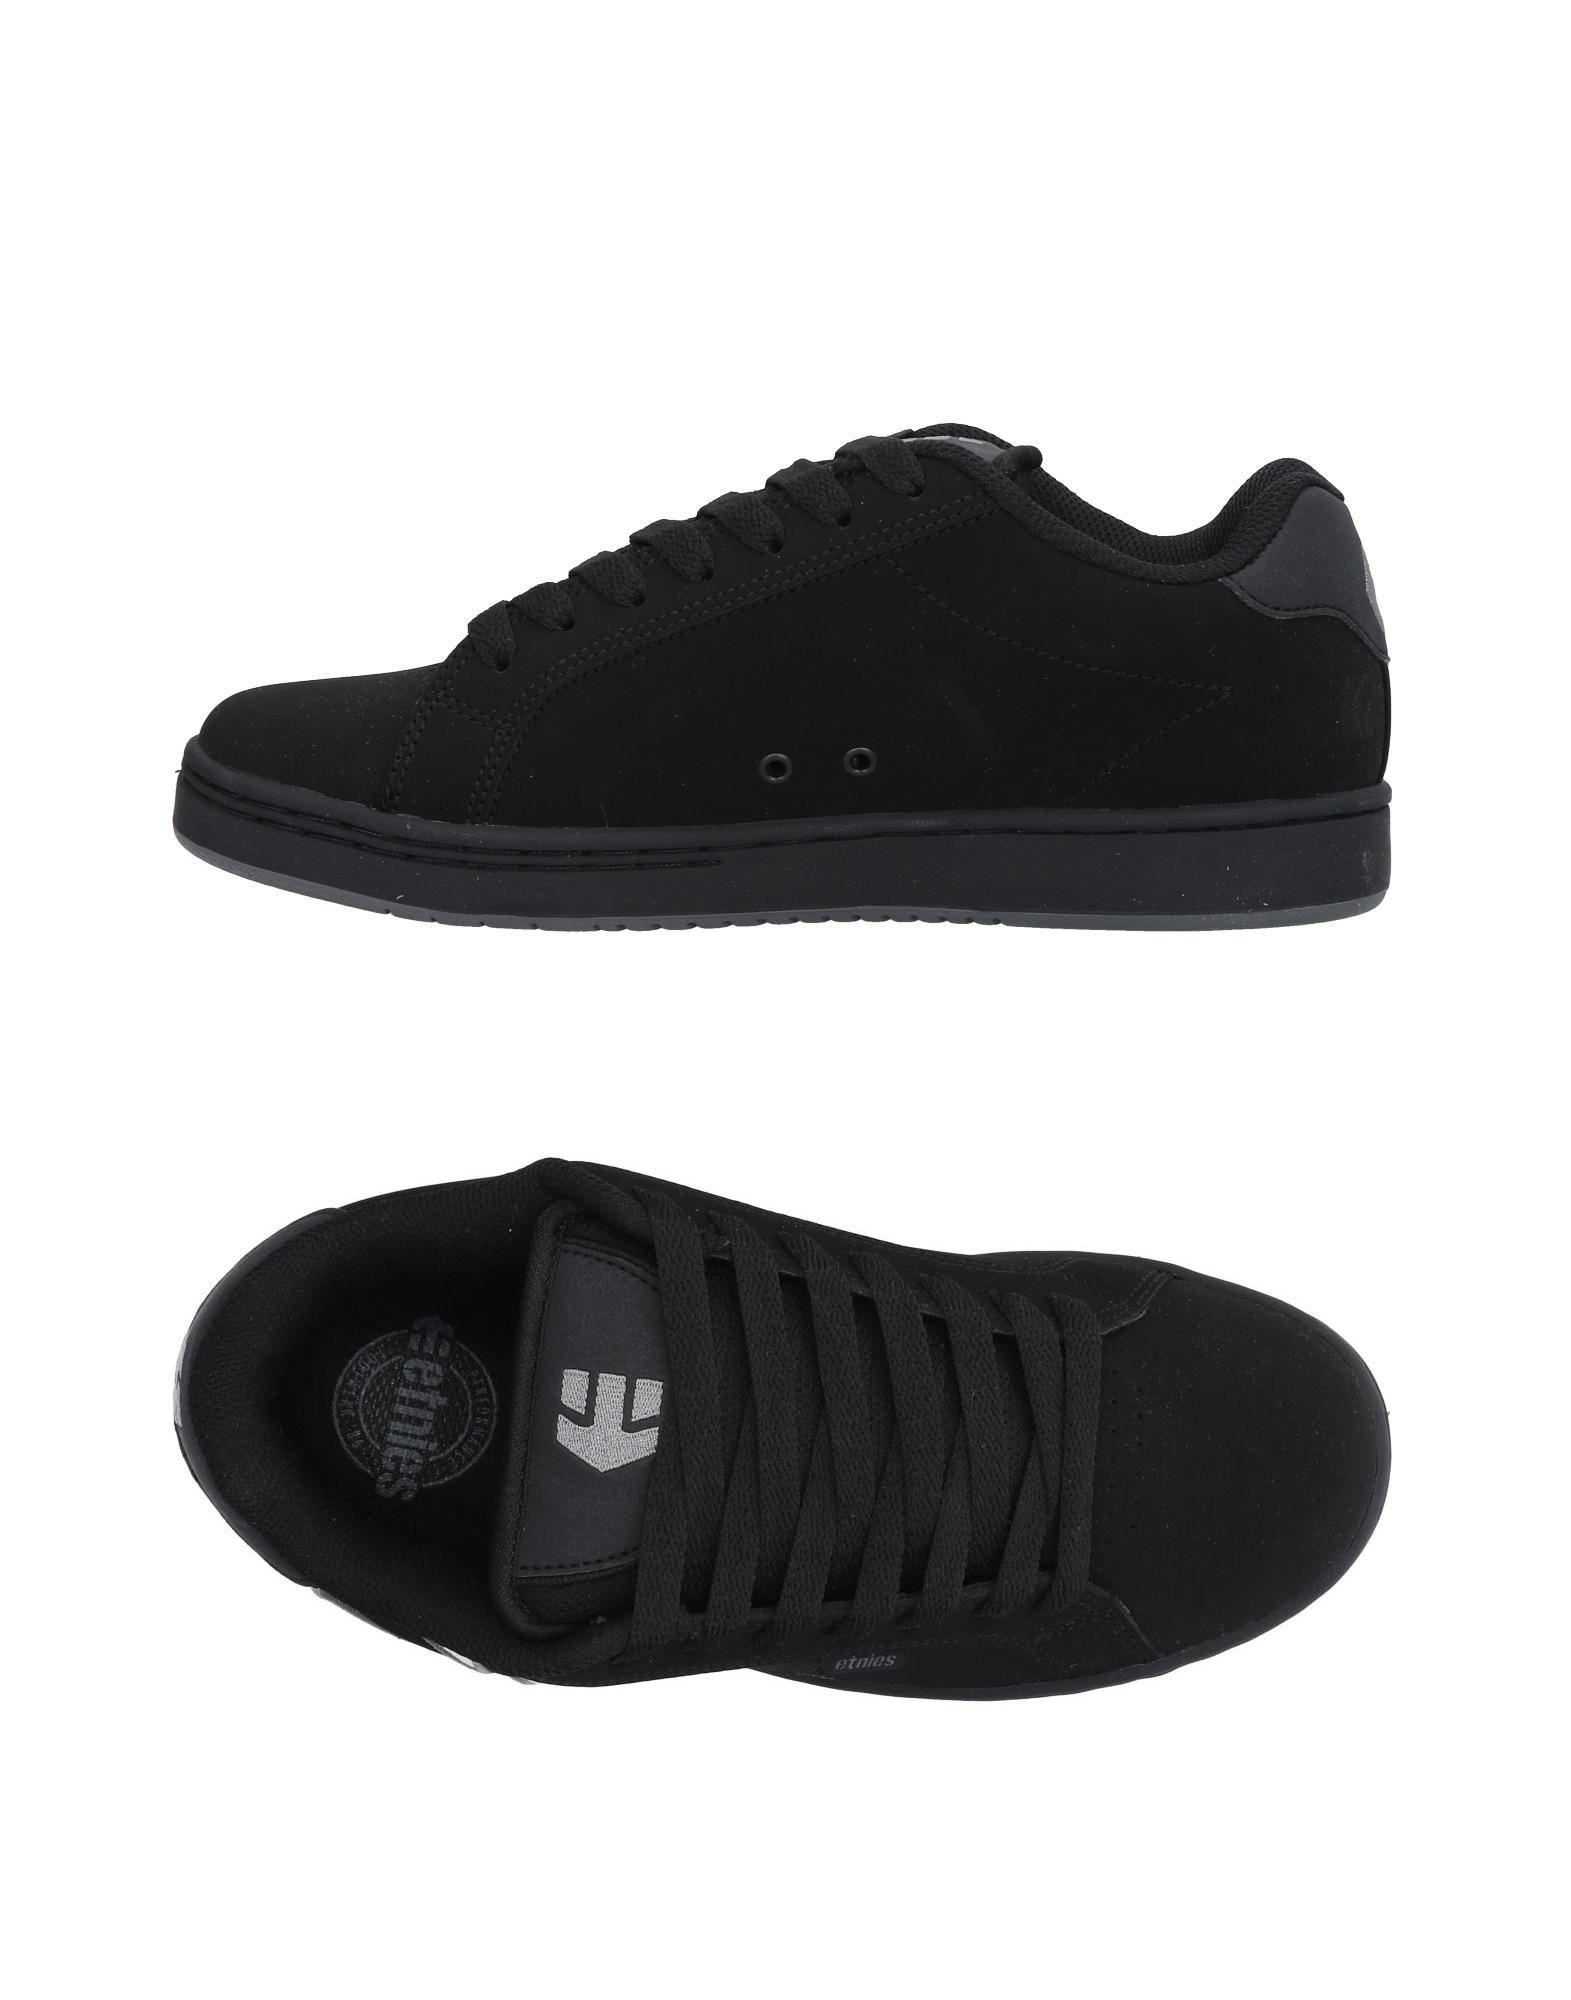 Sneakers Etnies Uomo - 11476459BK elegante